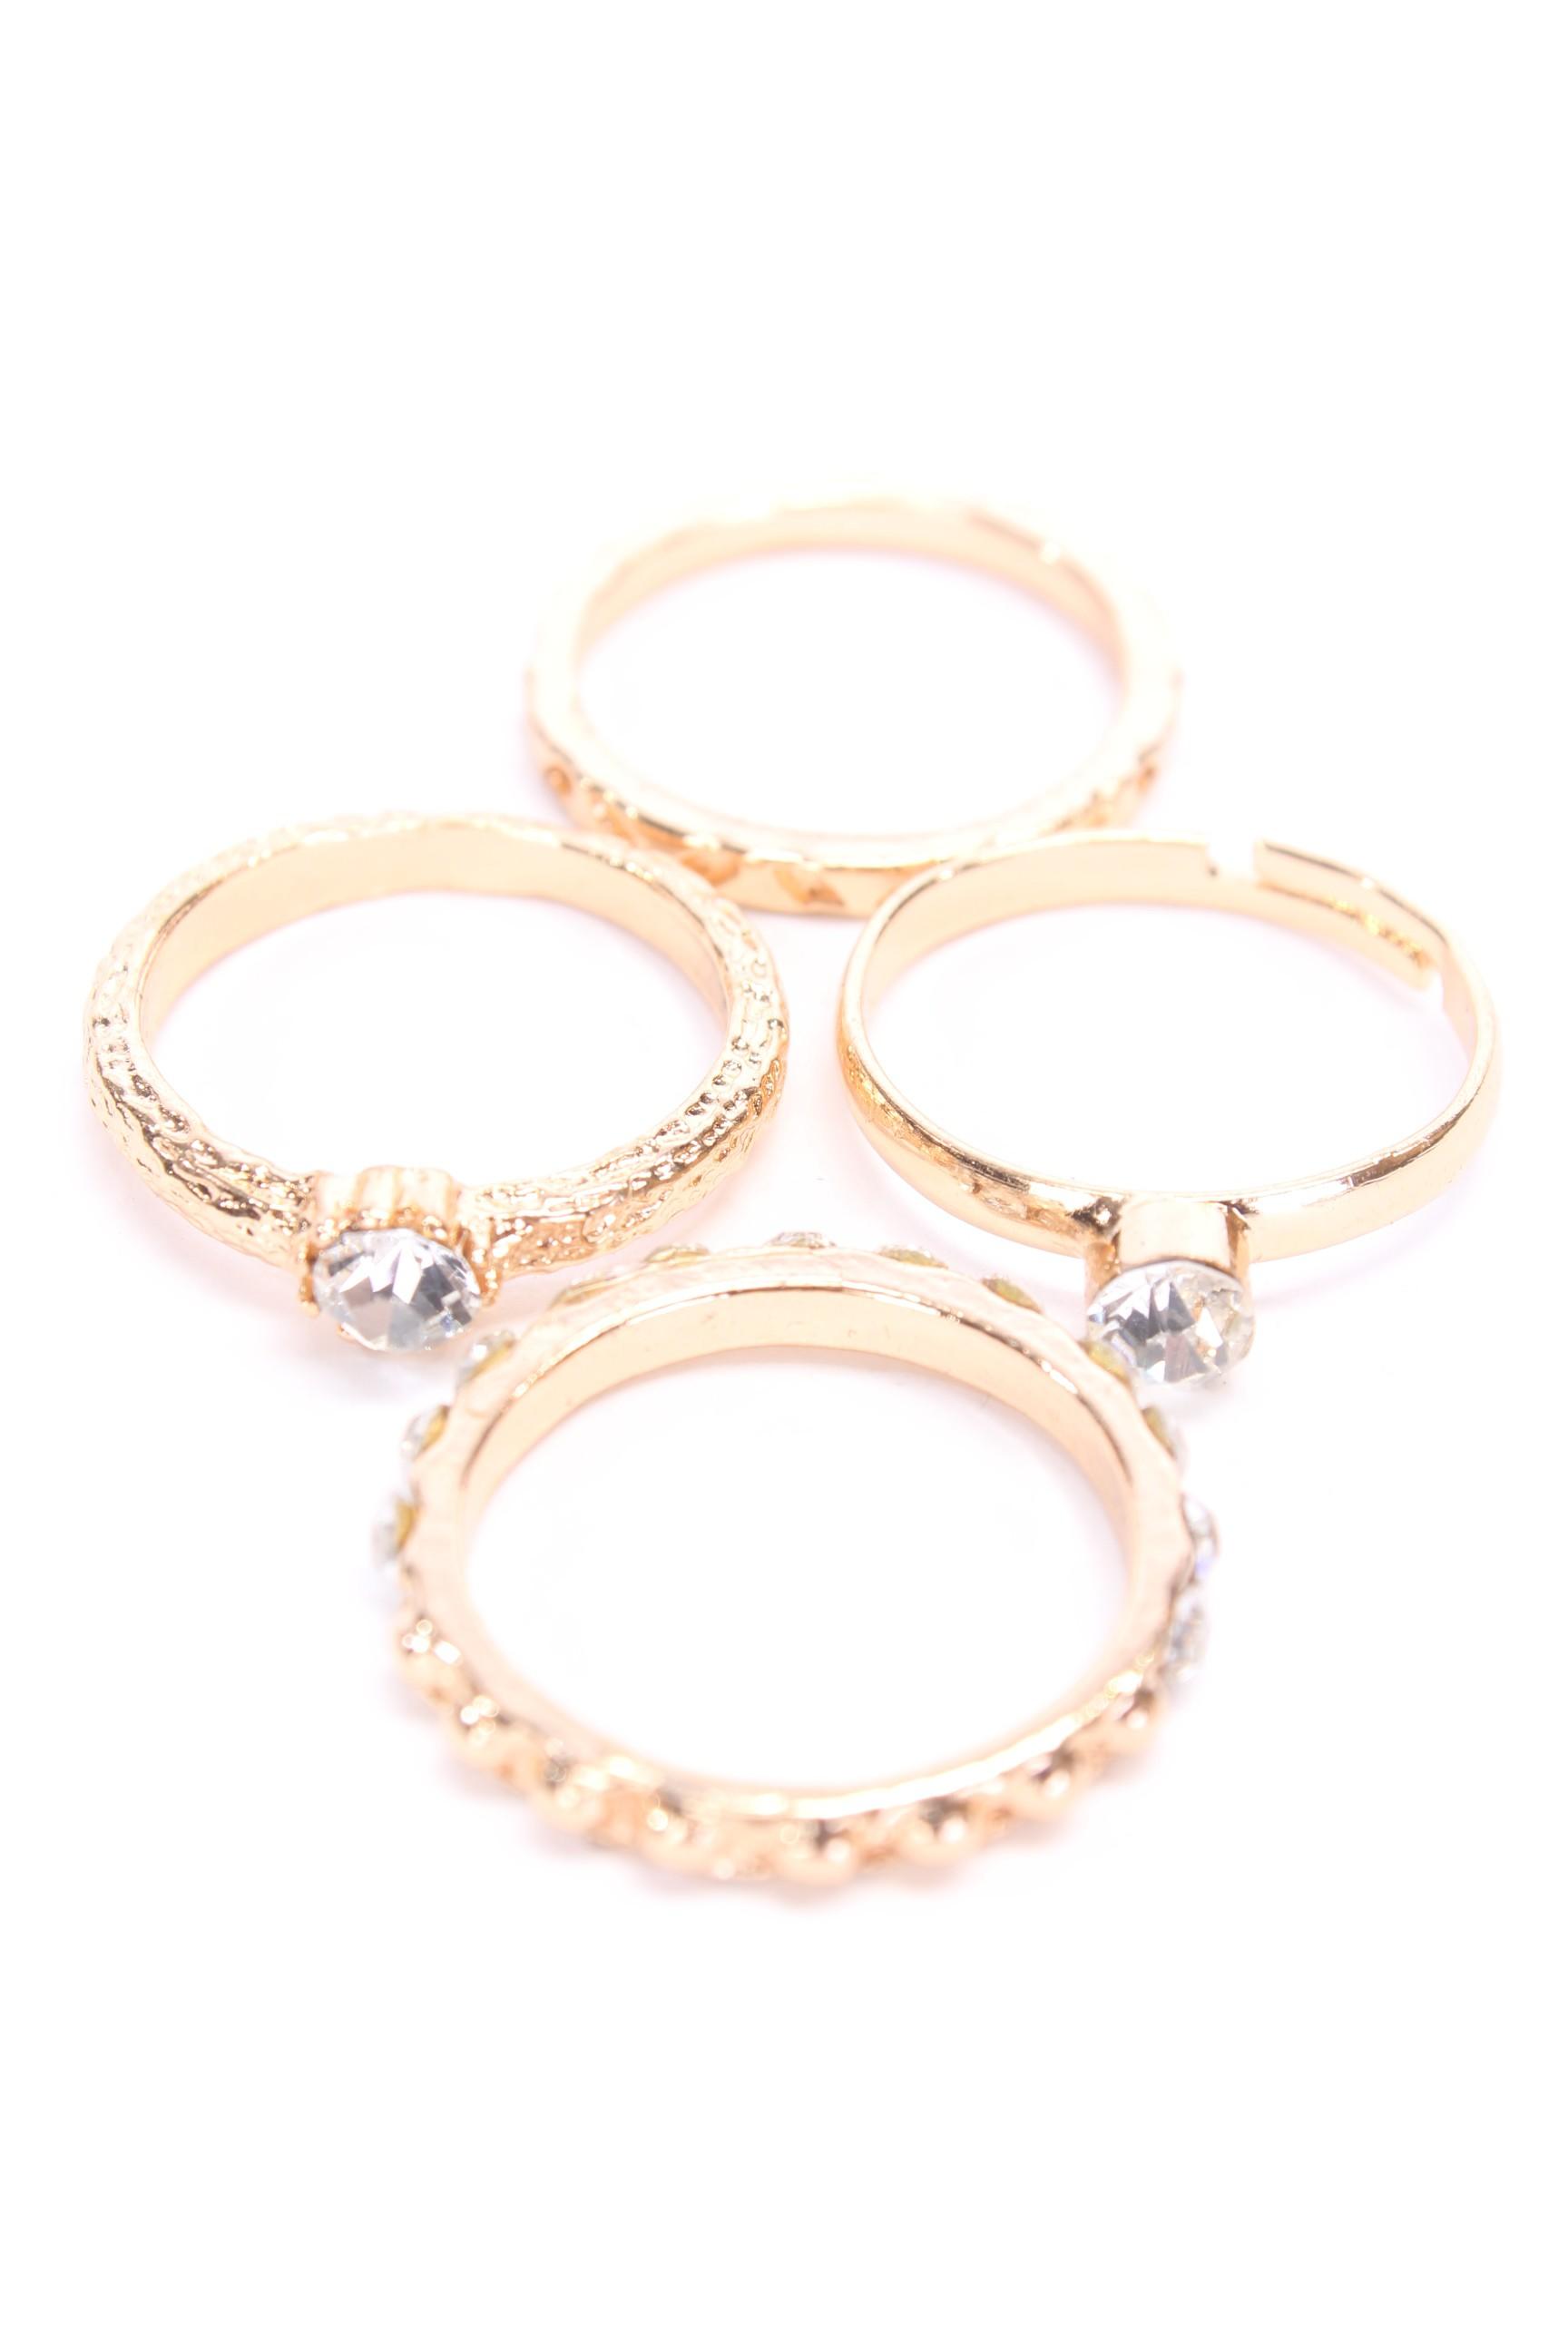 Gold High Polish Metal Cute Assorted Ring Set